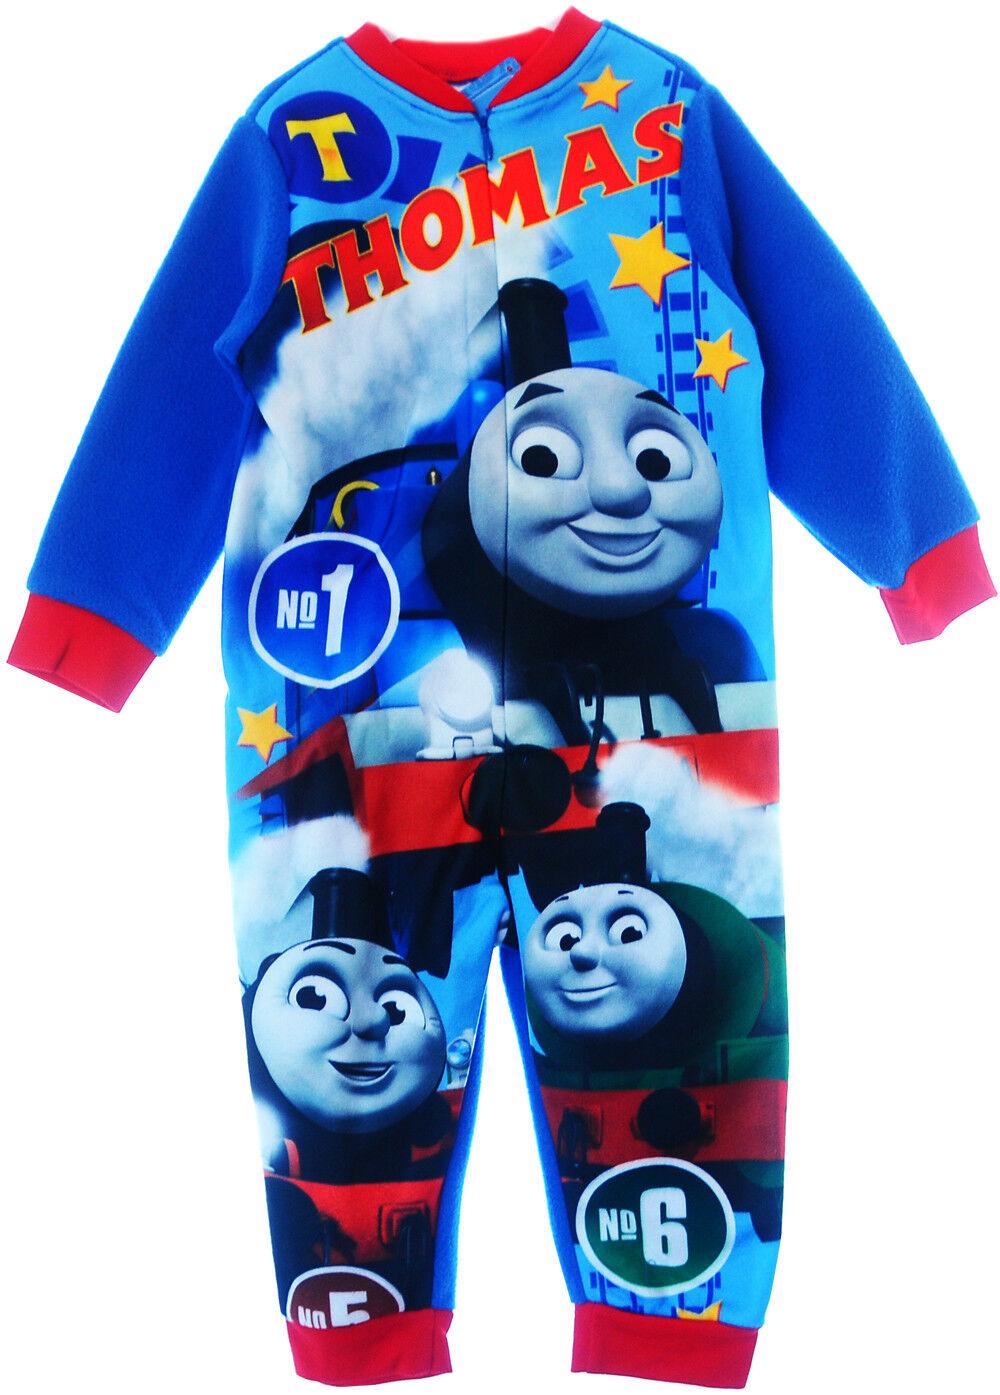 Pyjama Thomas & Friends Kinder Schlafanzug Overall Strampler Reißverschluss